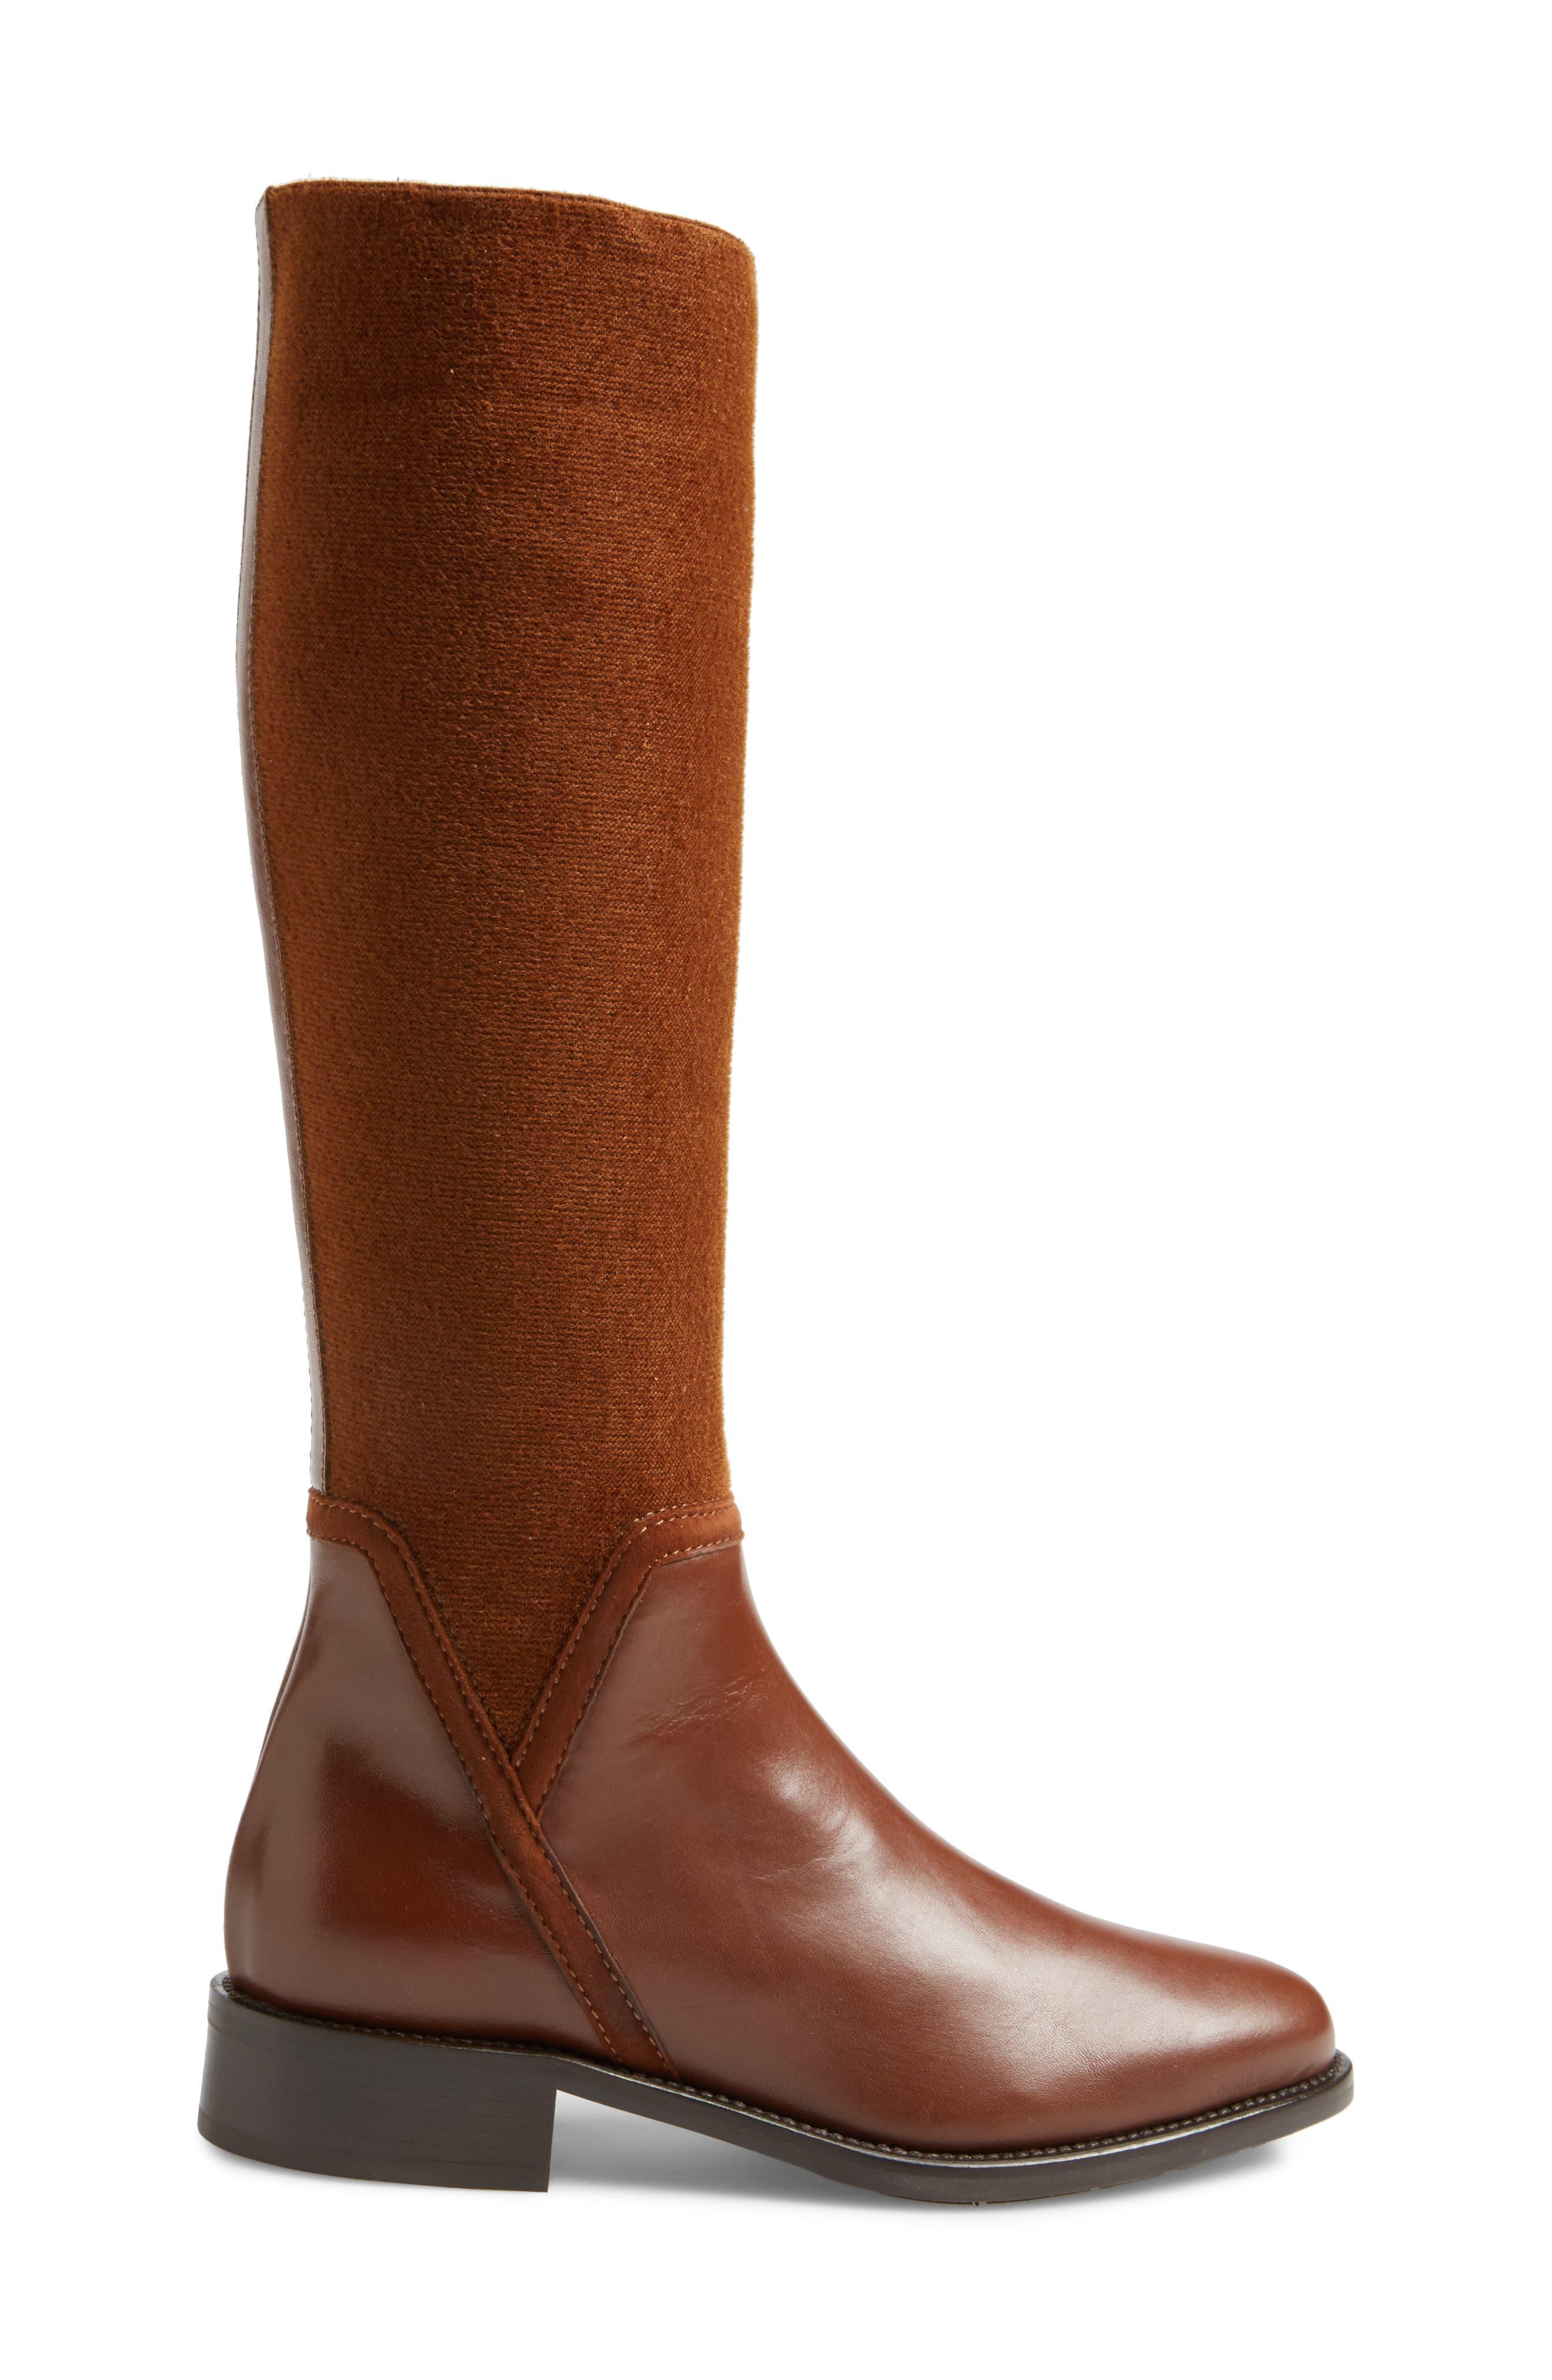 Nicolette Weatherproof Knee High Boot,                             Alternate thumbnail 3, color,                             Castagno Calf/ Elastic